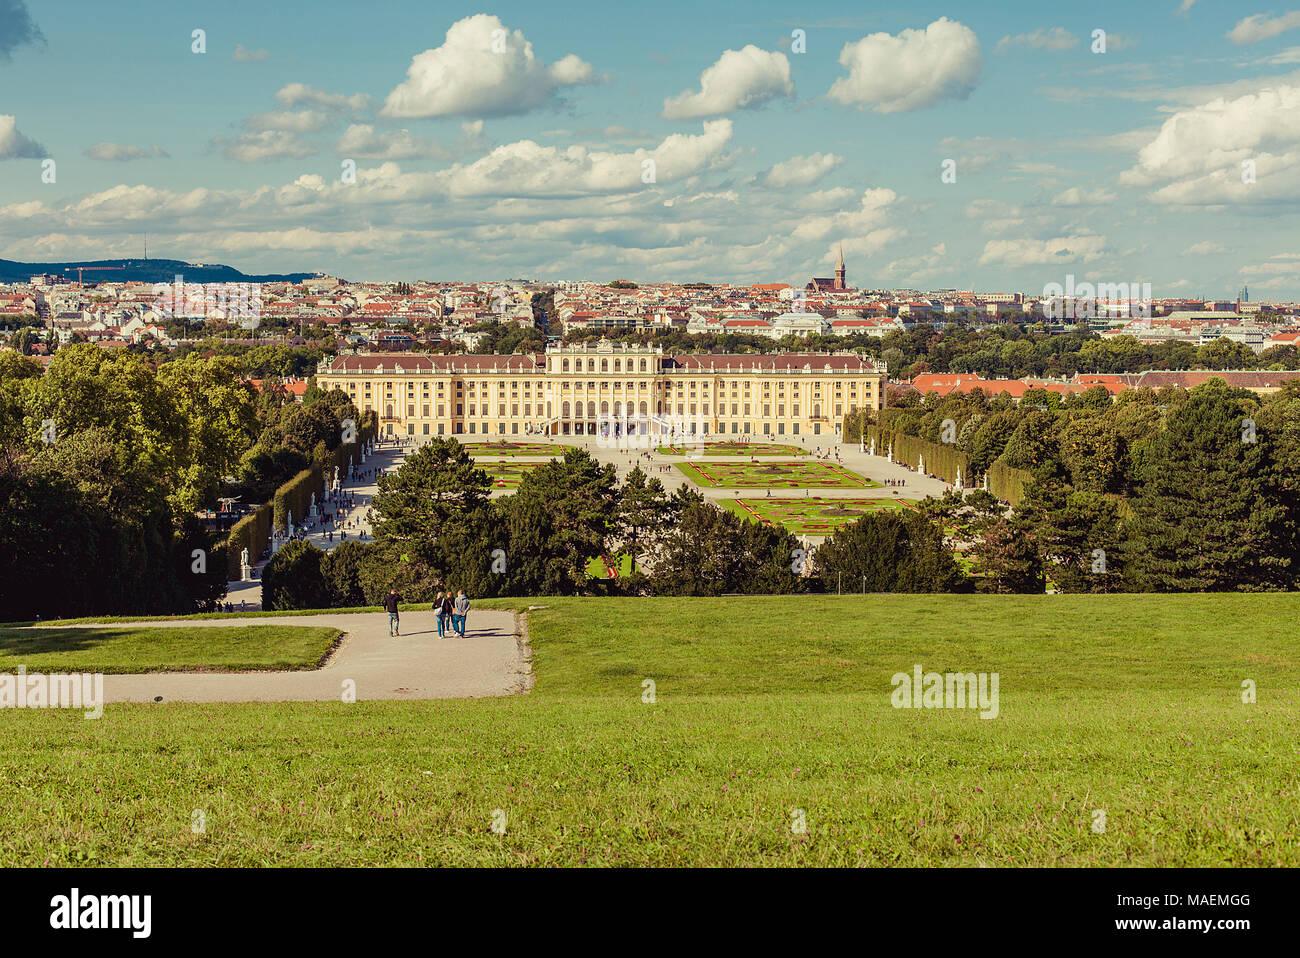 Schonbrunn Palace, Vienna, Austria - Stock Image